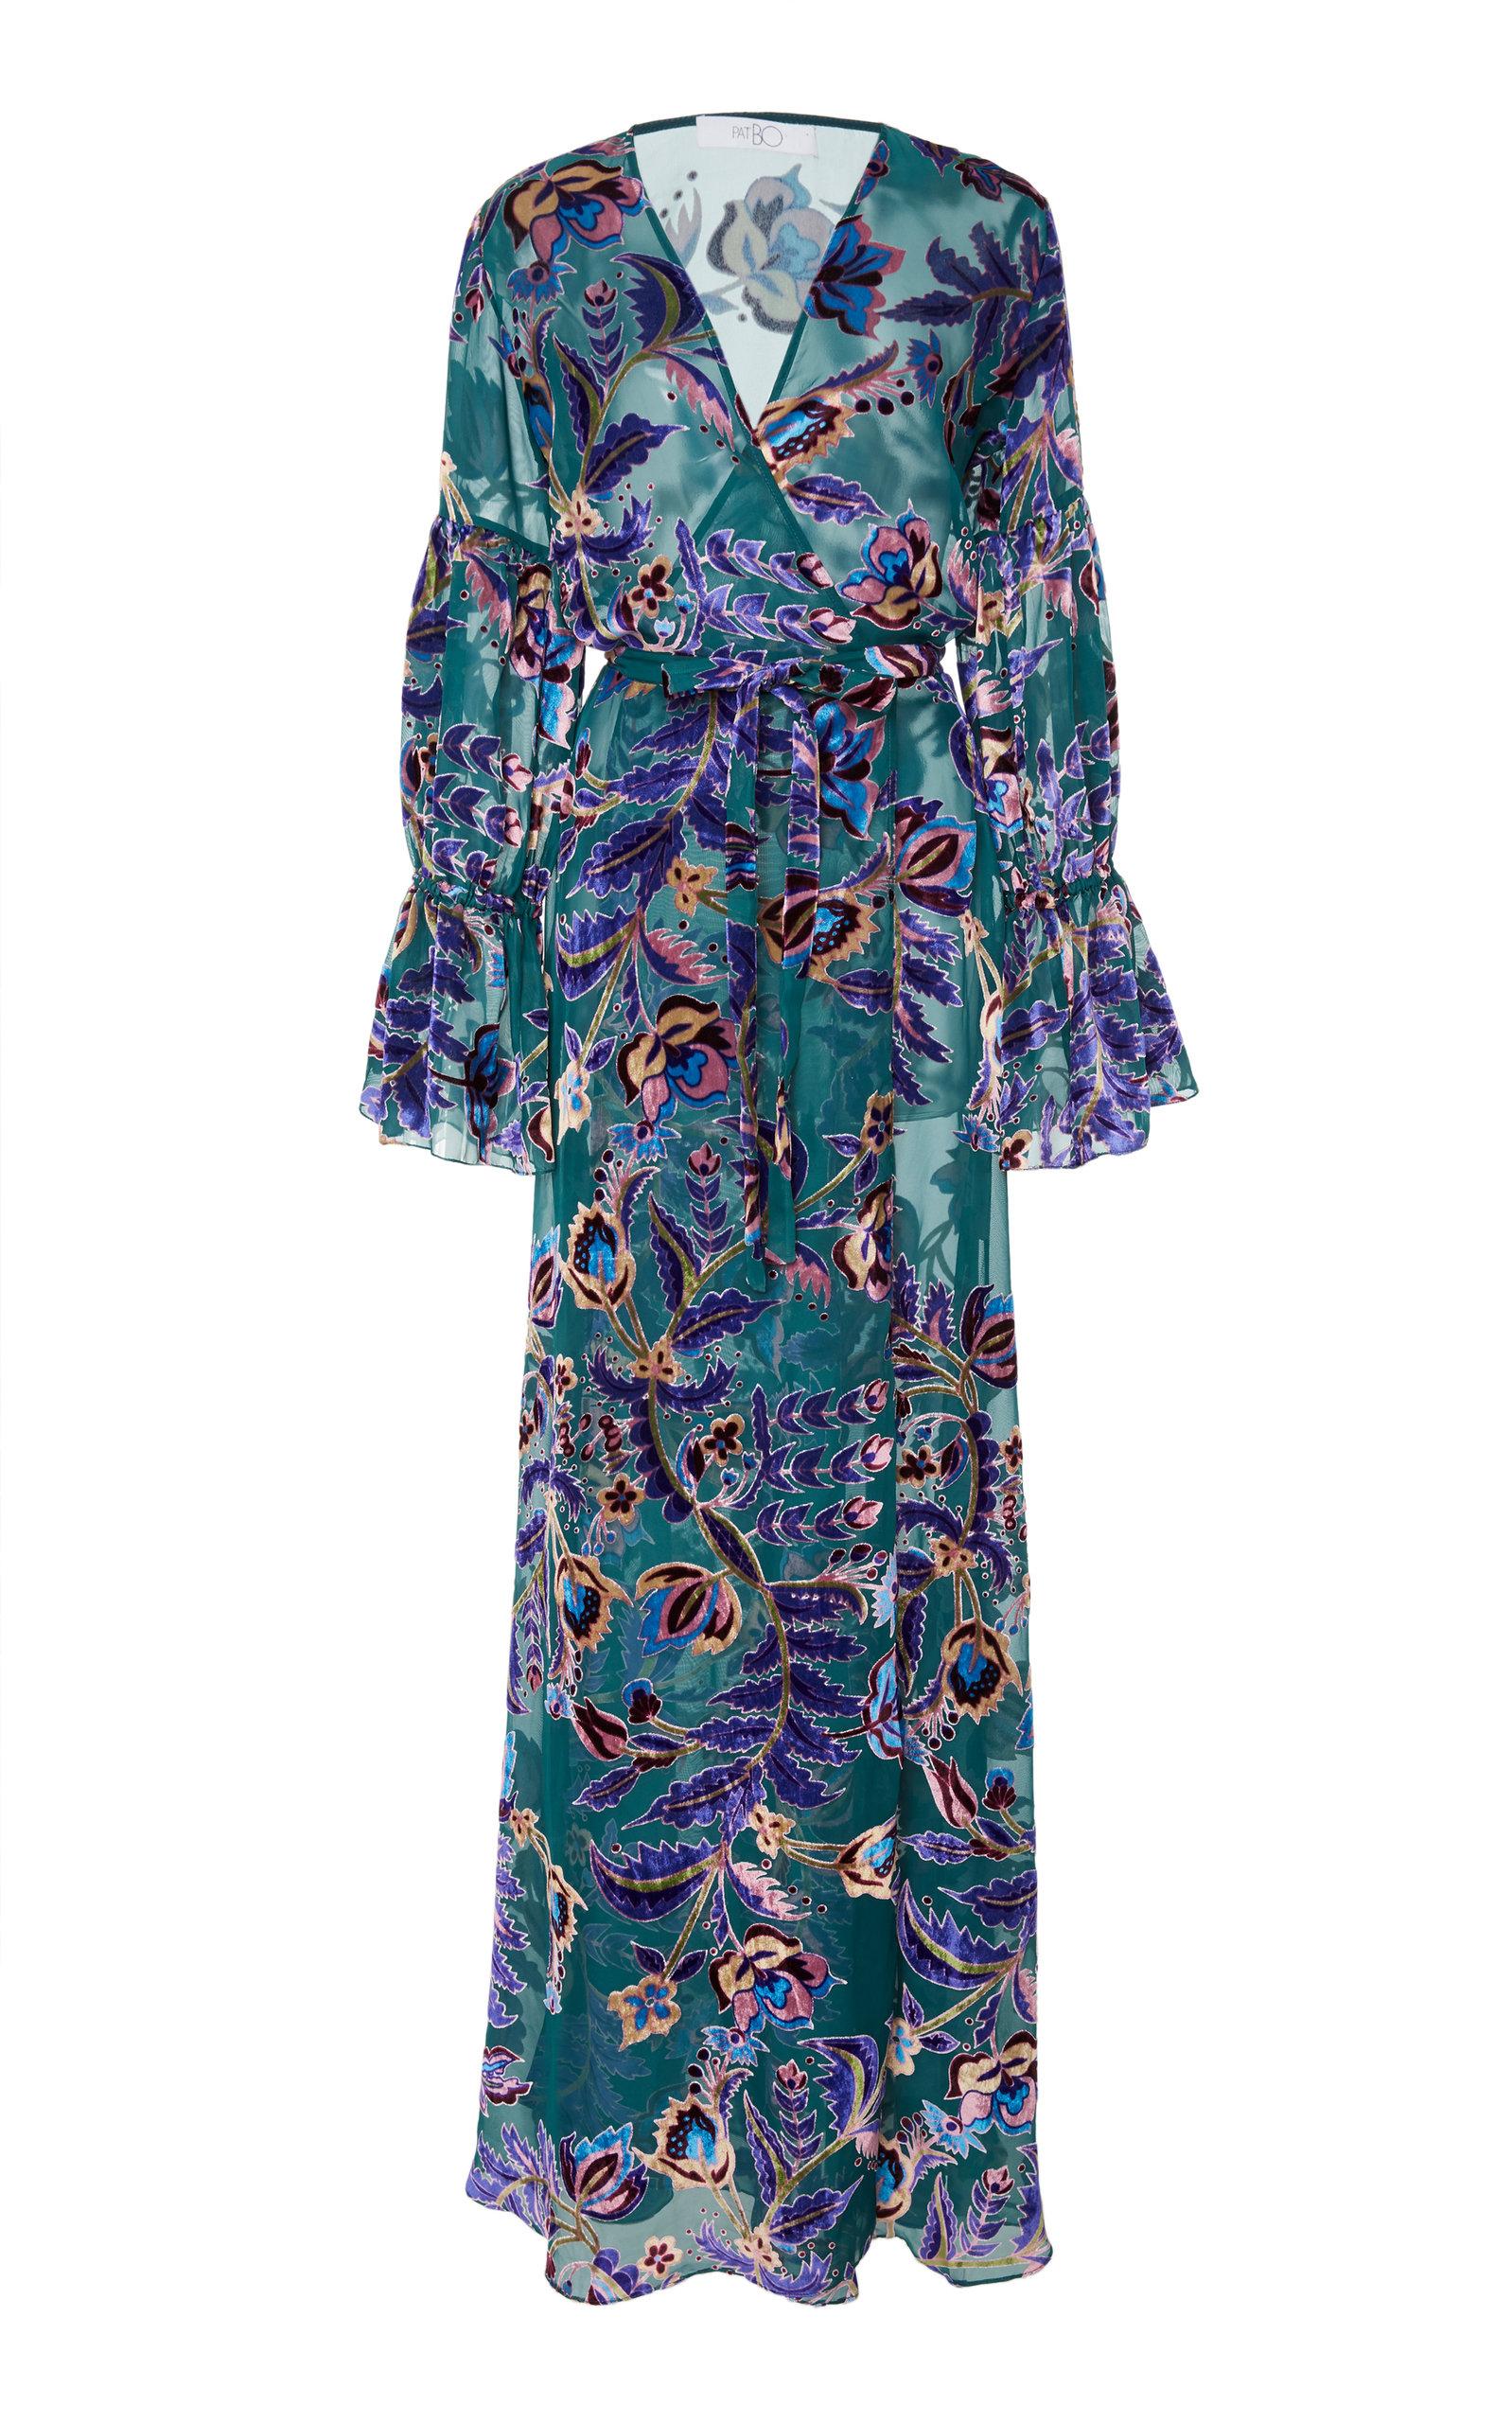 PATBO Burnout Velvet Maxi Wrap Dress in Print